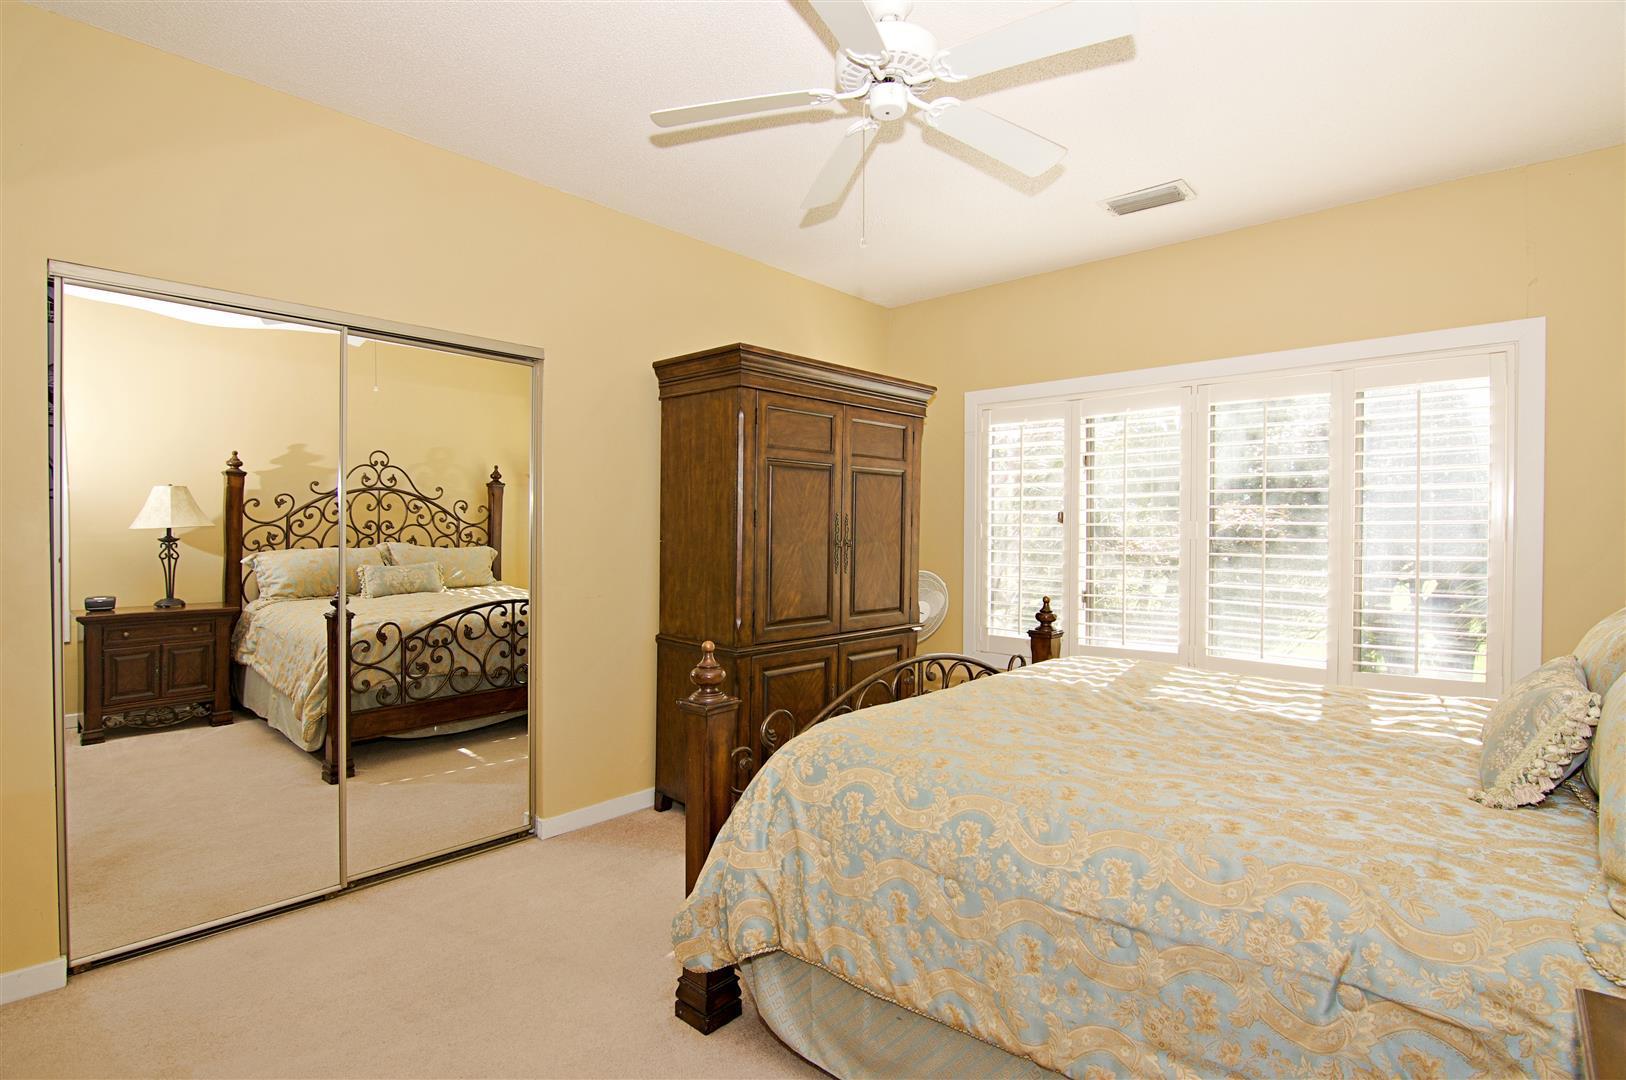 Seabrook Island Homes For Sale - 3020 Ocean Winds, Seabrook Island, SC - 30